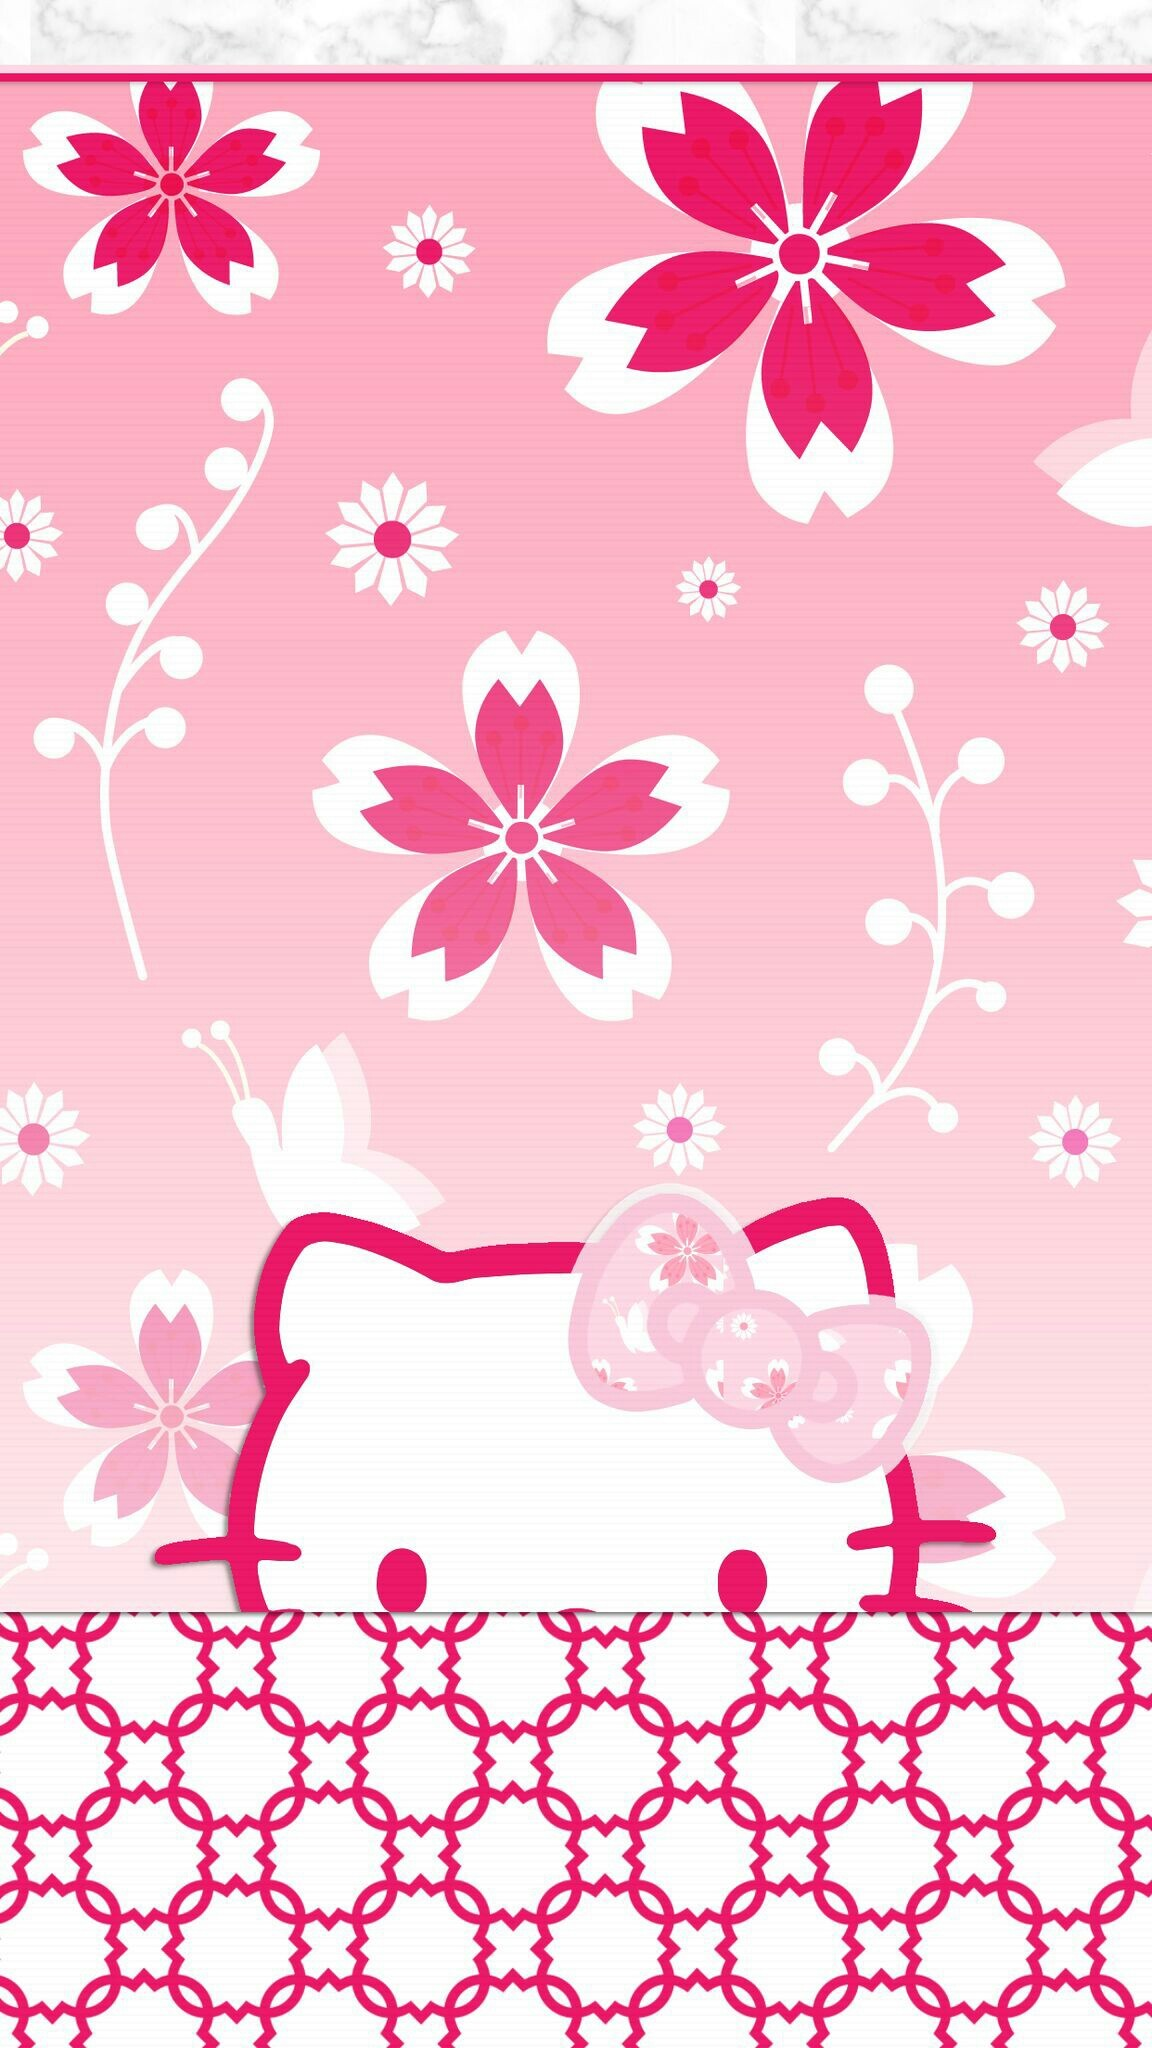 Beautiful Wallpaper Hello Kitty Punk - 929203-popular-cute-wallpapers-of-hello-kitty-1152x2048  Image_71648.jpg